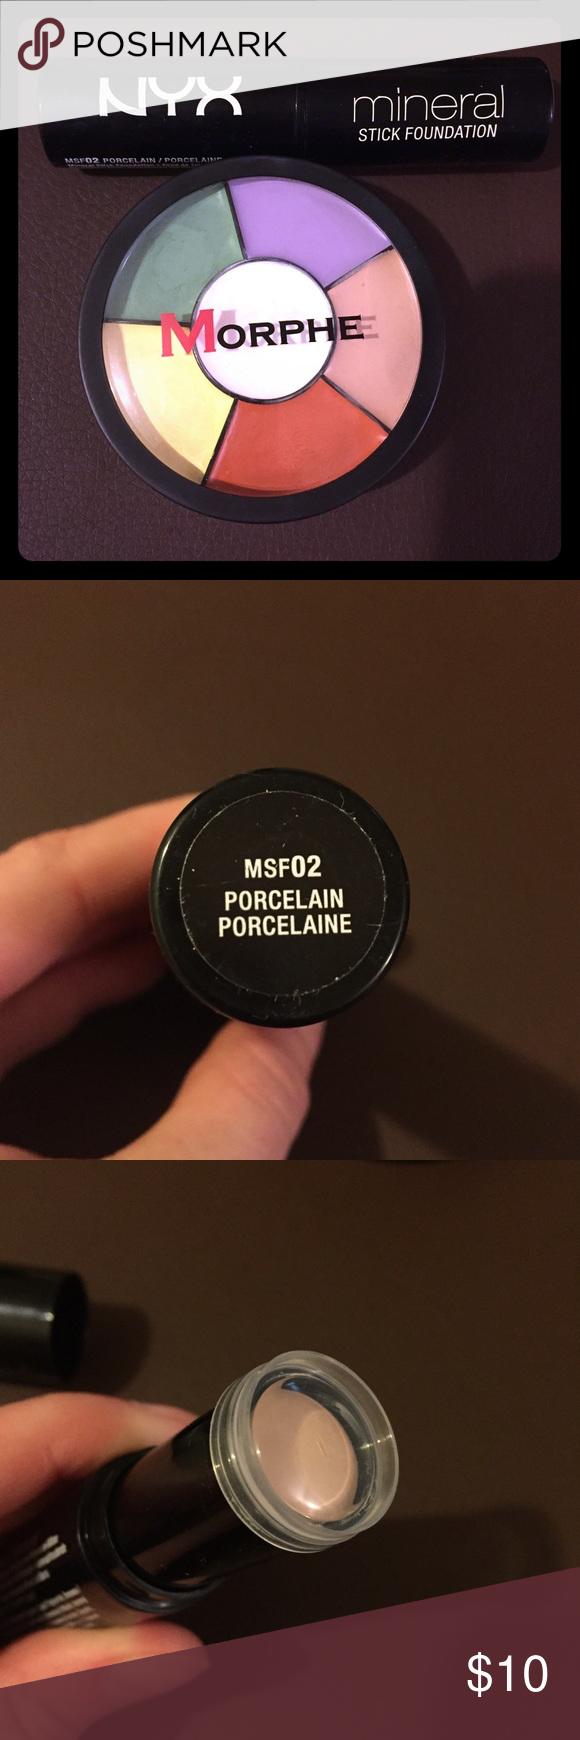 Mineral Foundation Stick + Color Corrector Wheel Color